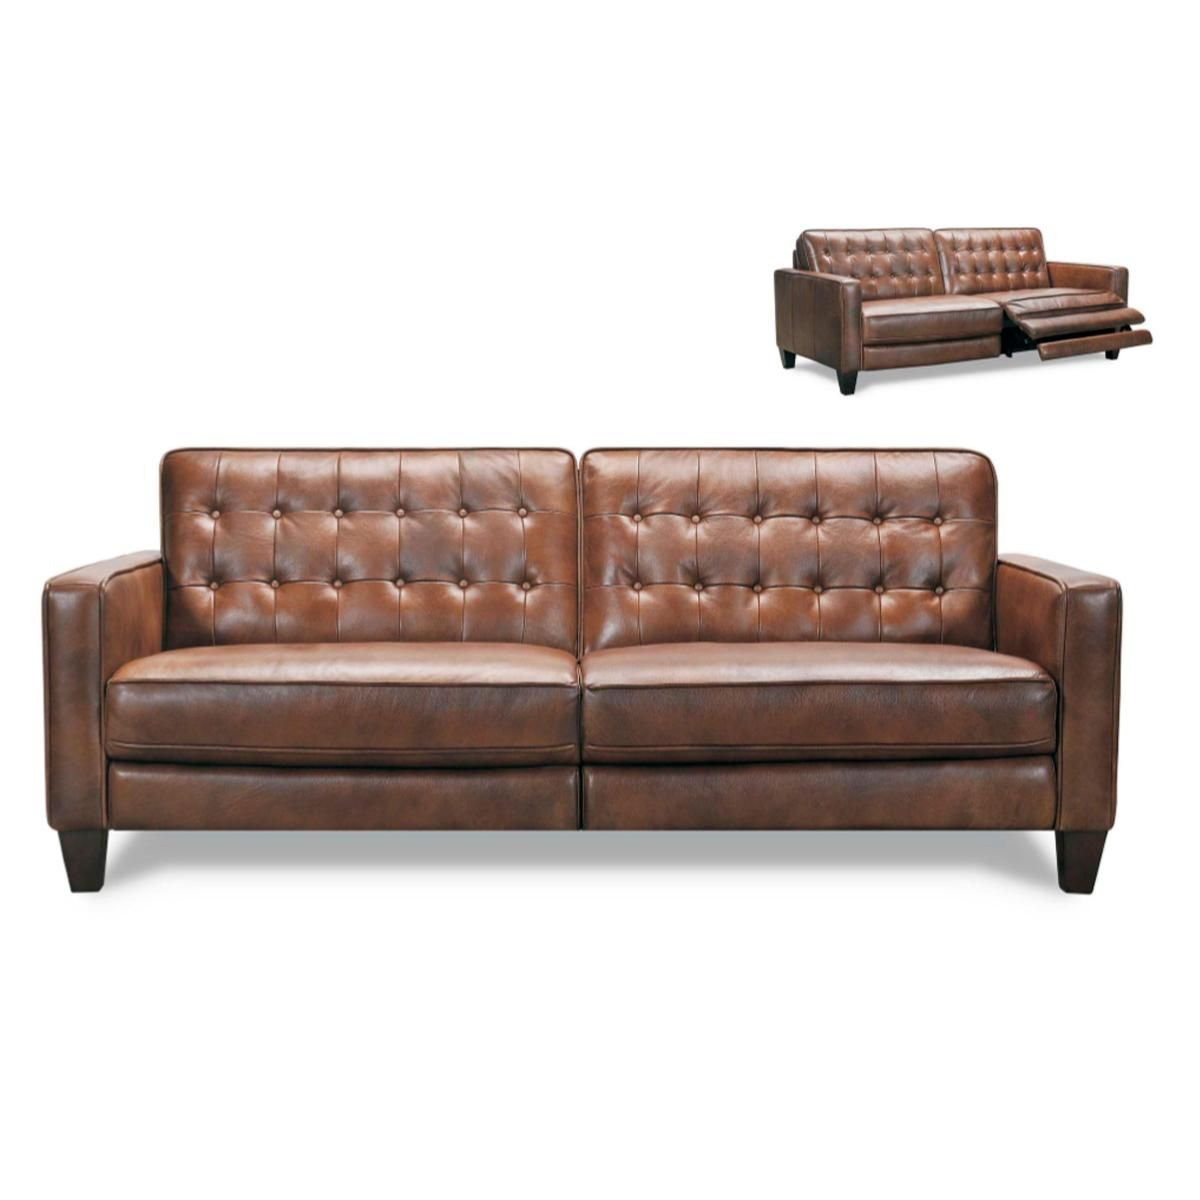 Violino Leather Sofa With Power Footrest In Classico Chestnut Nebraska Furniture Mart In 2020 Leather Sofa Furniture Sofa